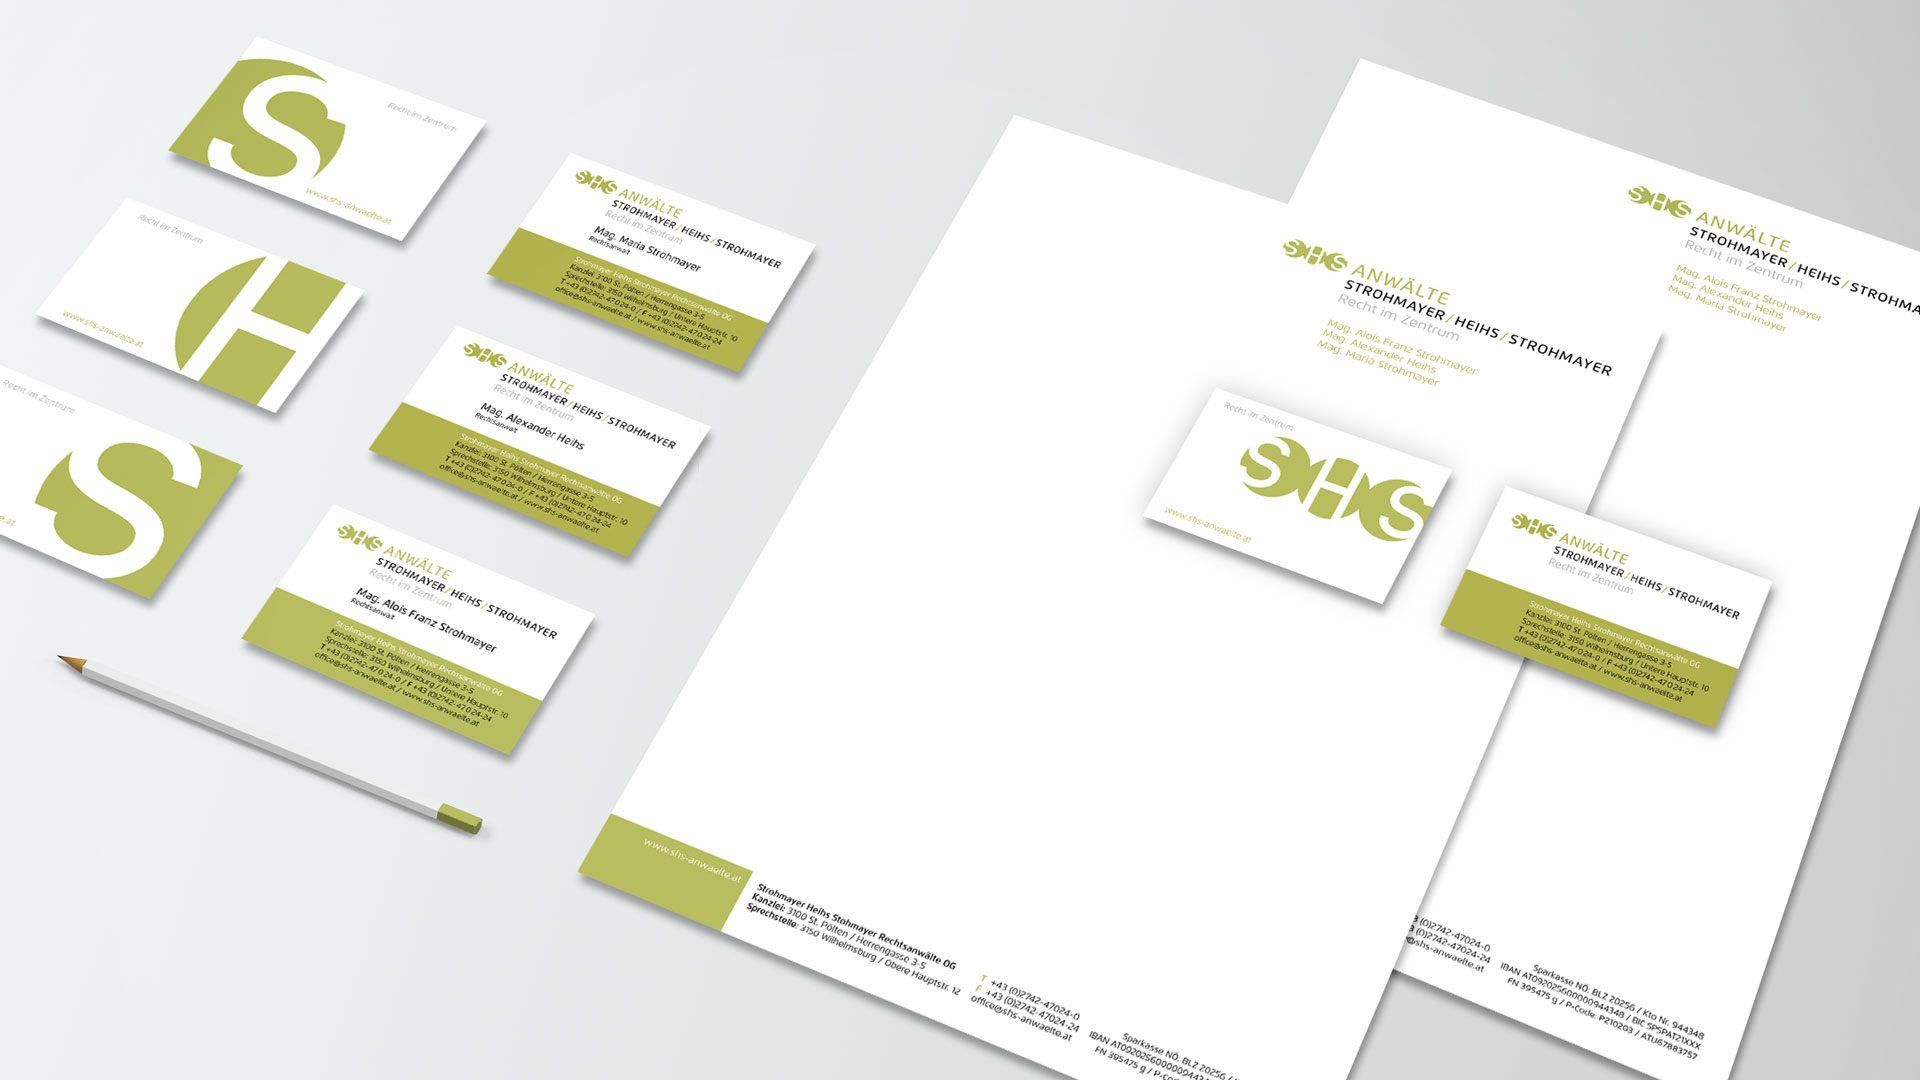 SHS Corporate Design